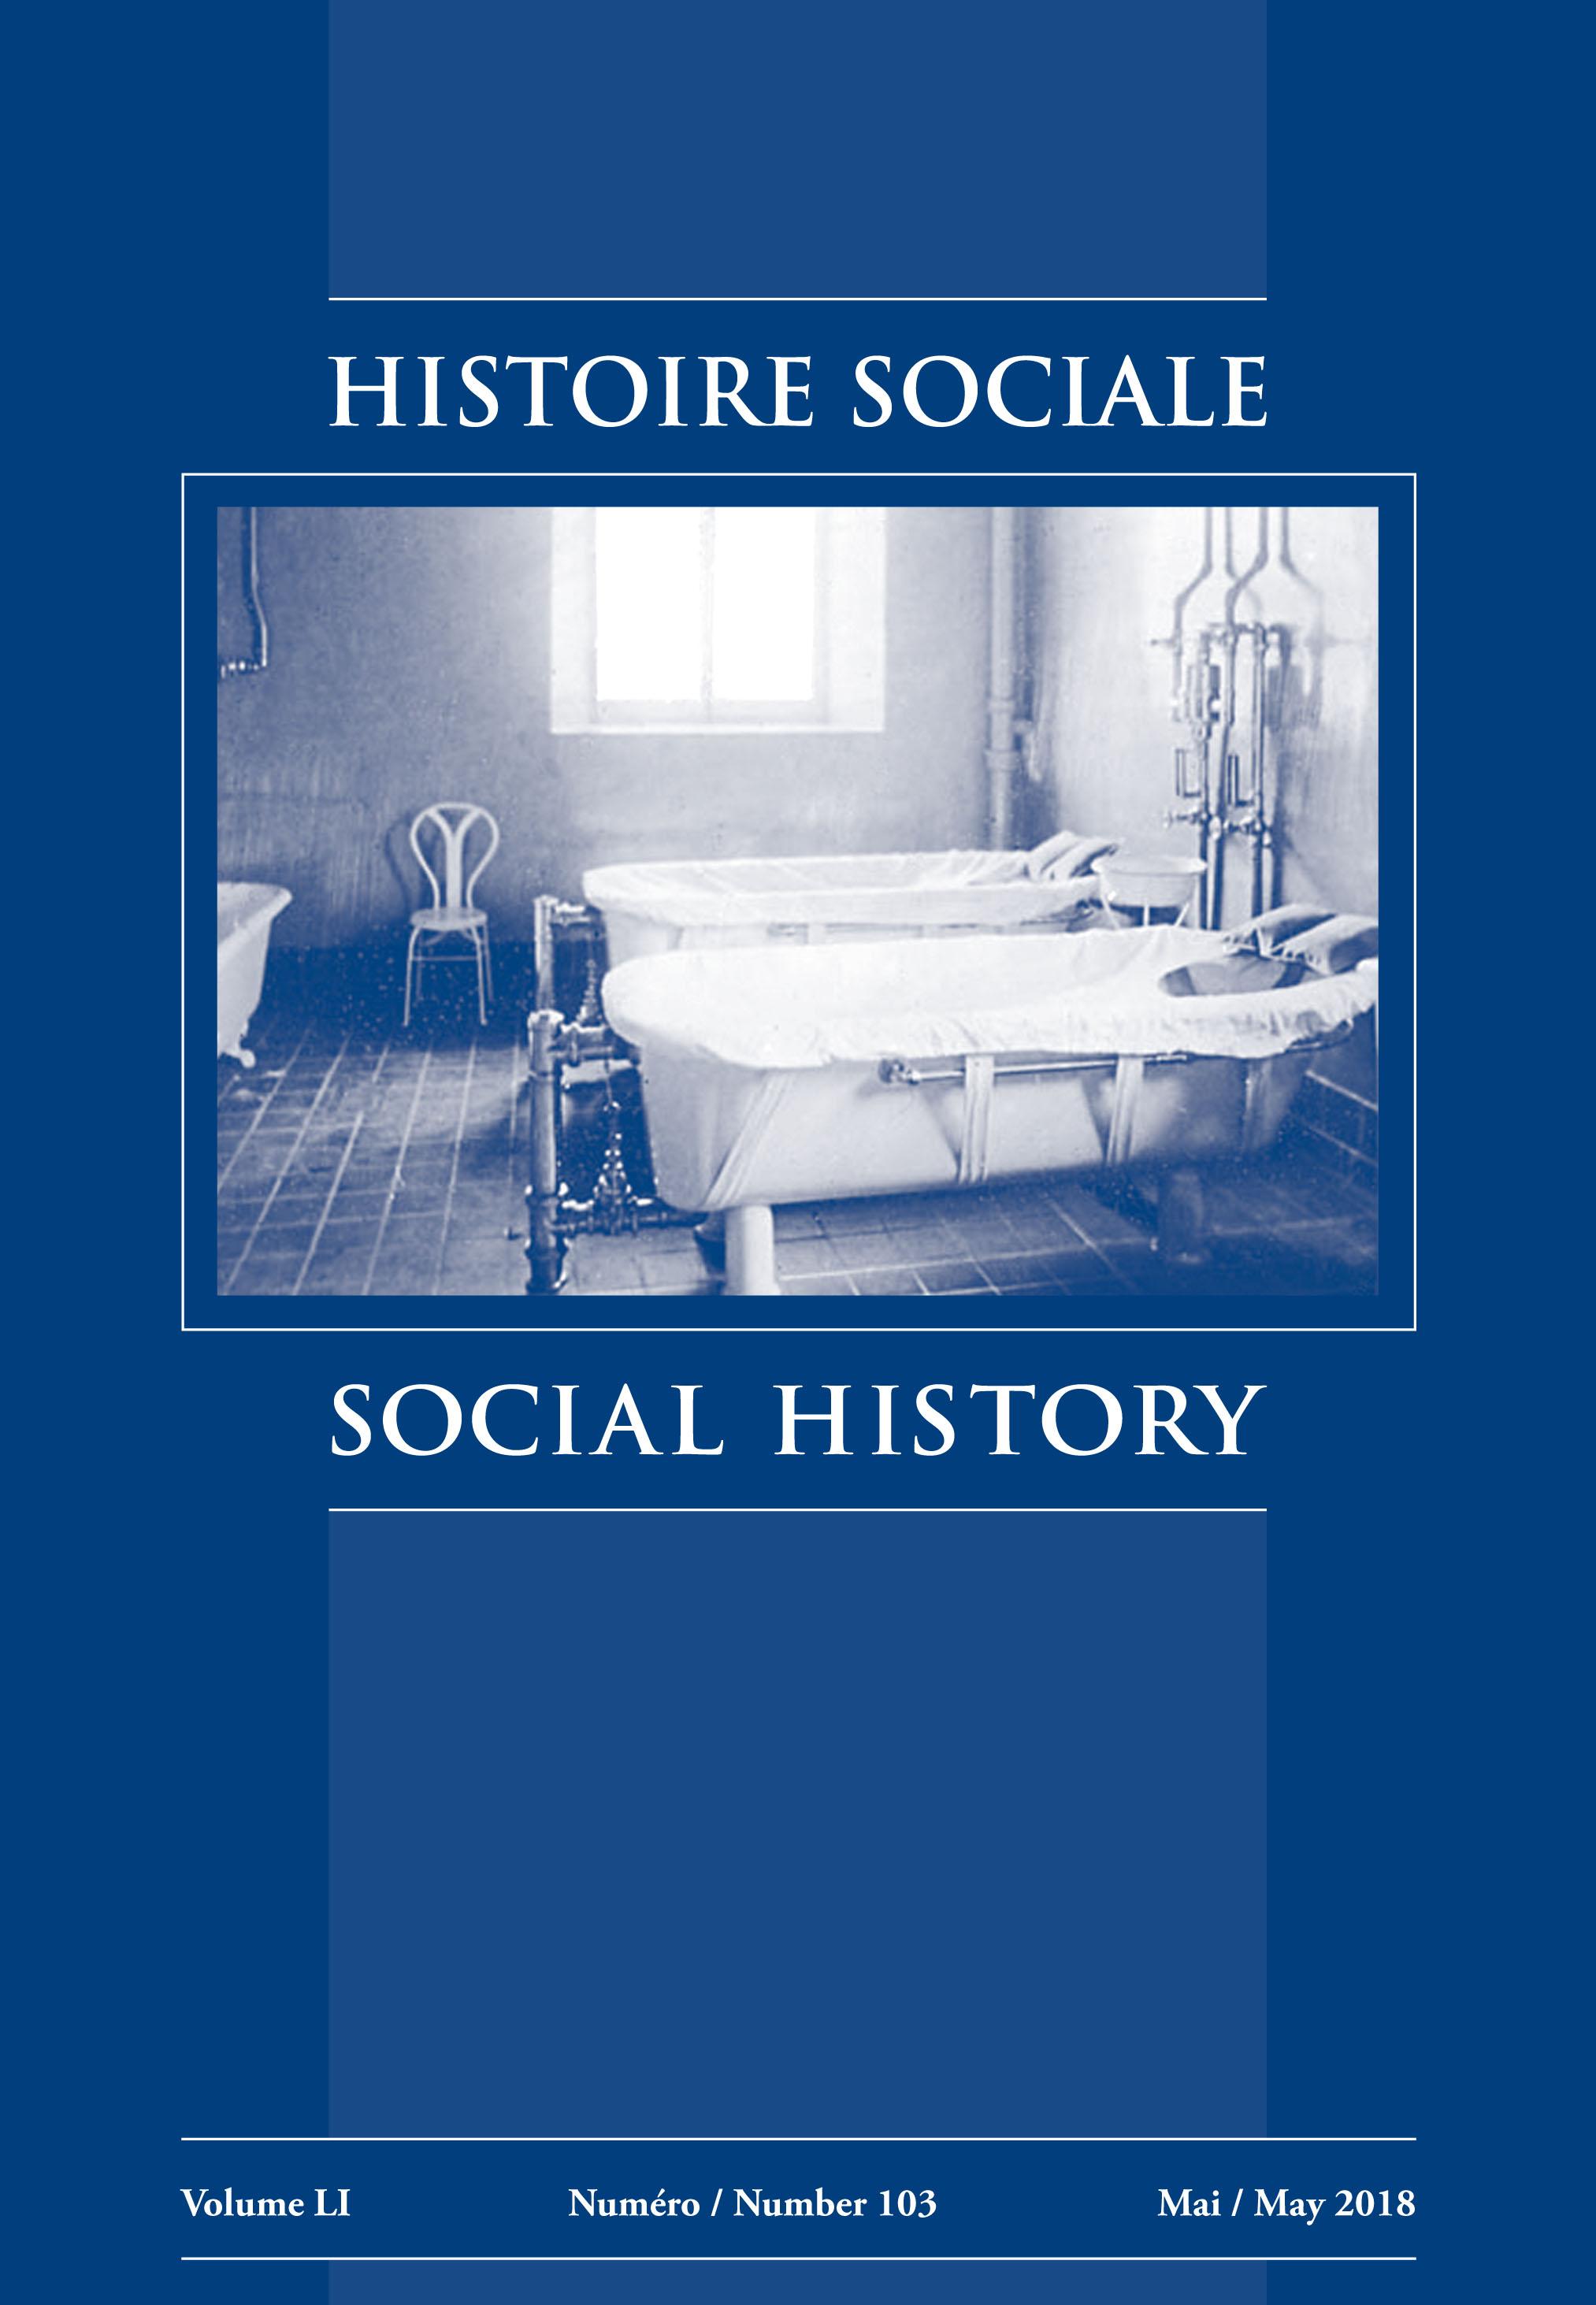 HISTOIRE SOCIALE / SOCIAL HISTORY Volume LI No 103 (May 2018))